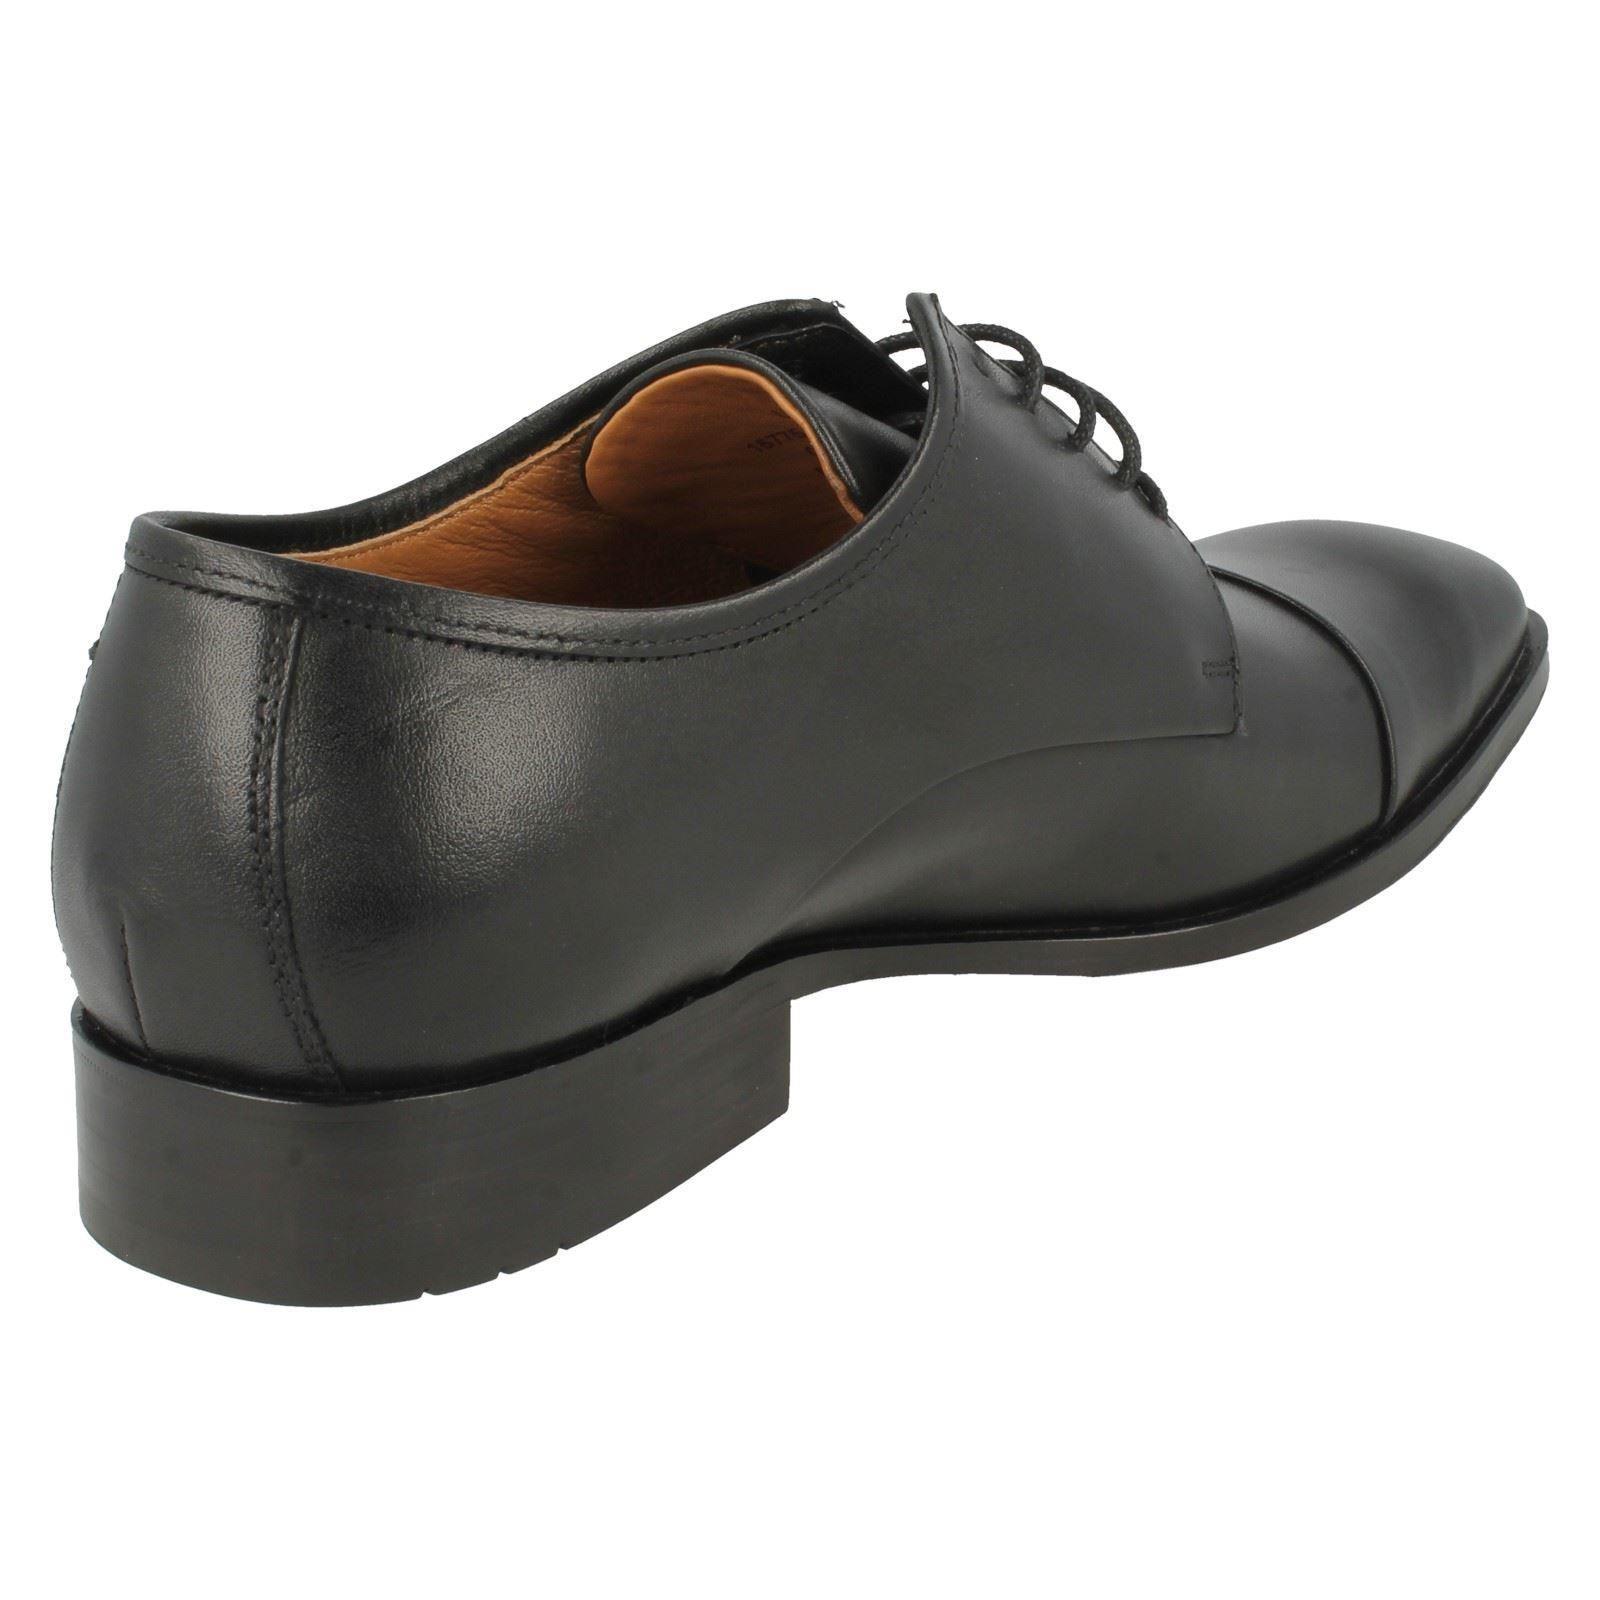 Uomo Dexie Clarks Lace Up Schuhes Dexie Uomo Cap 8dcac1